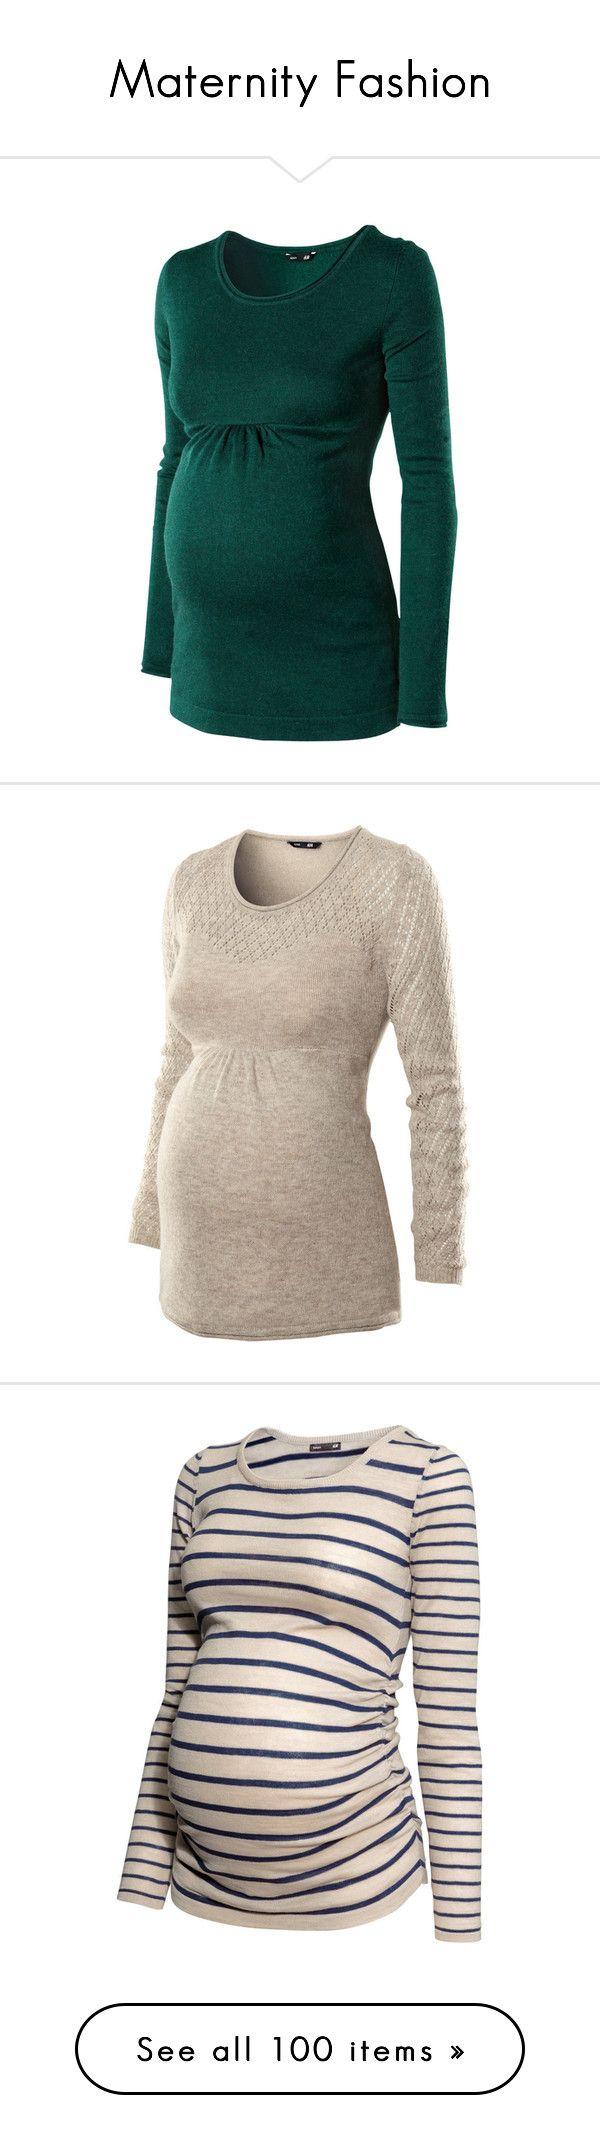 """Maternity Fashion"" by bitbyacullen ❤ liked on Polyvore"